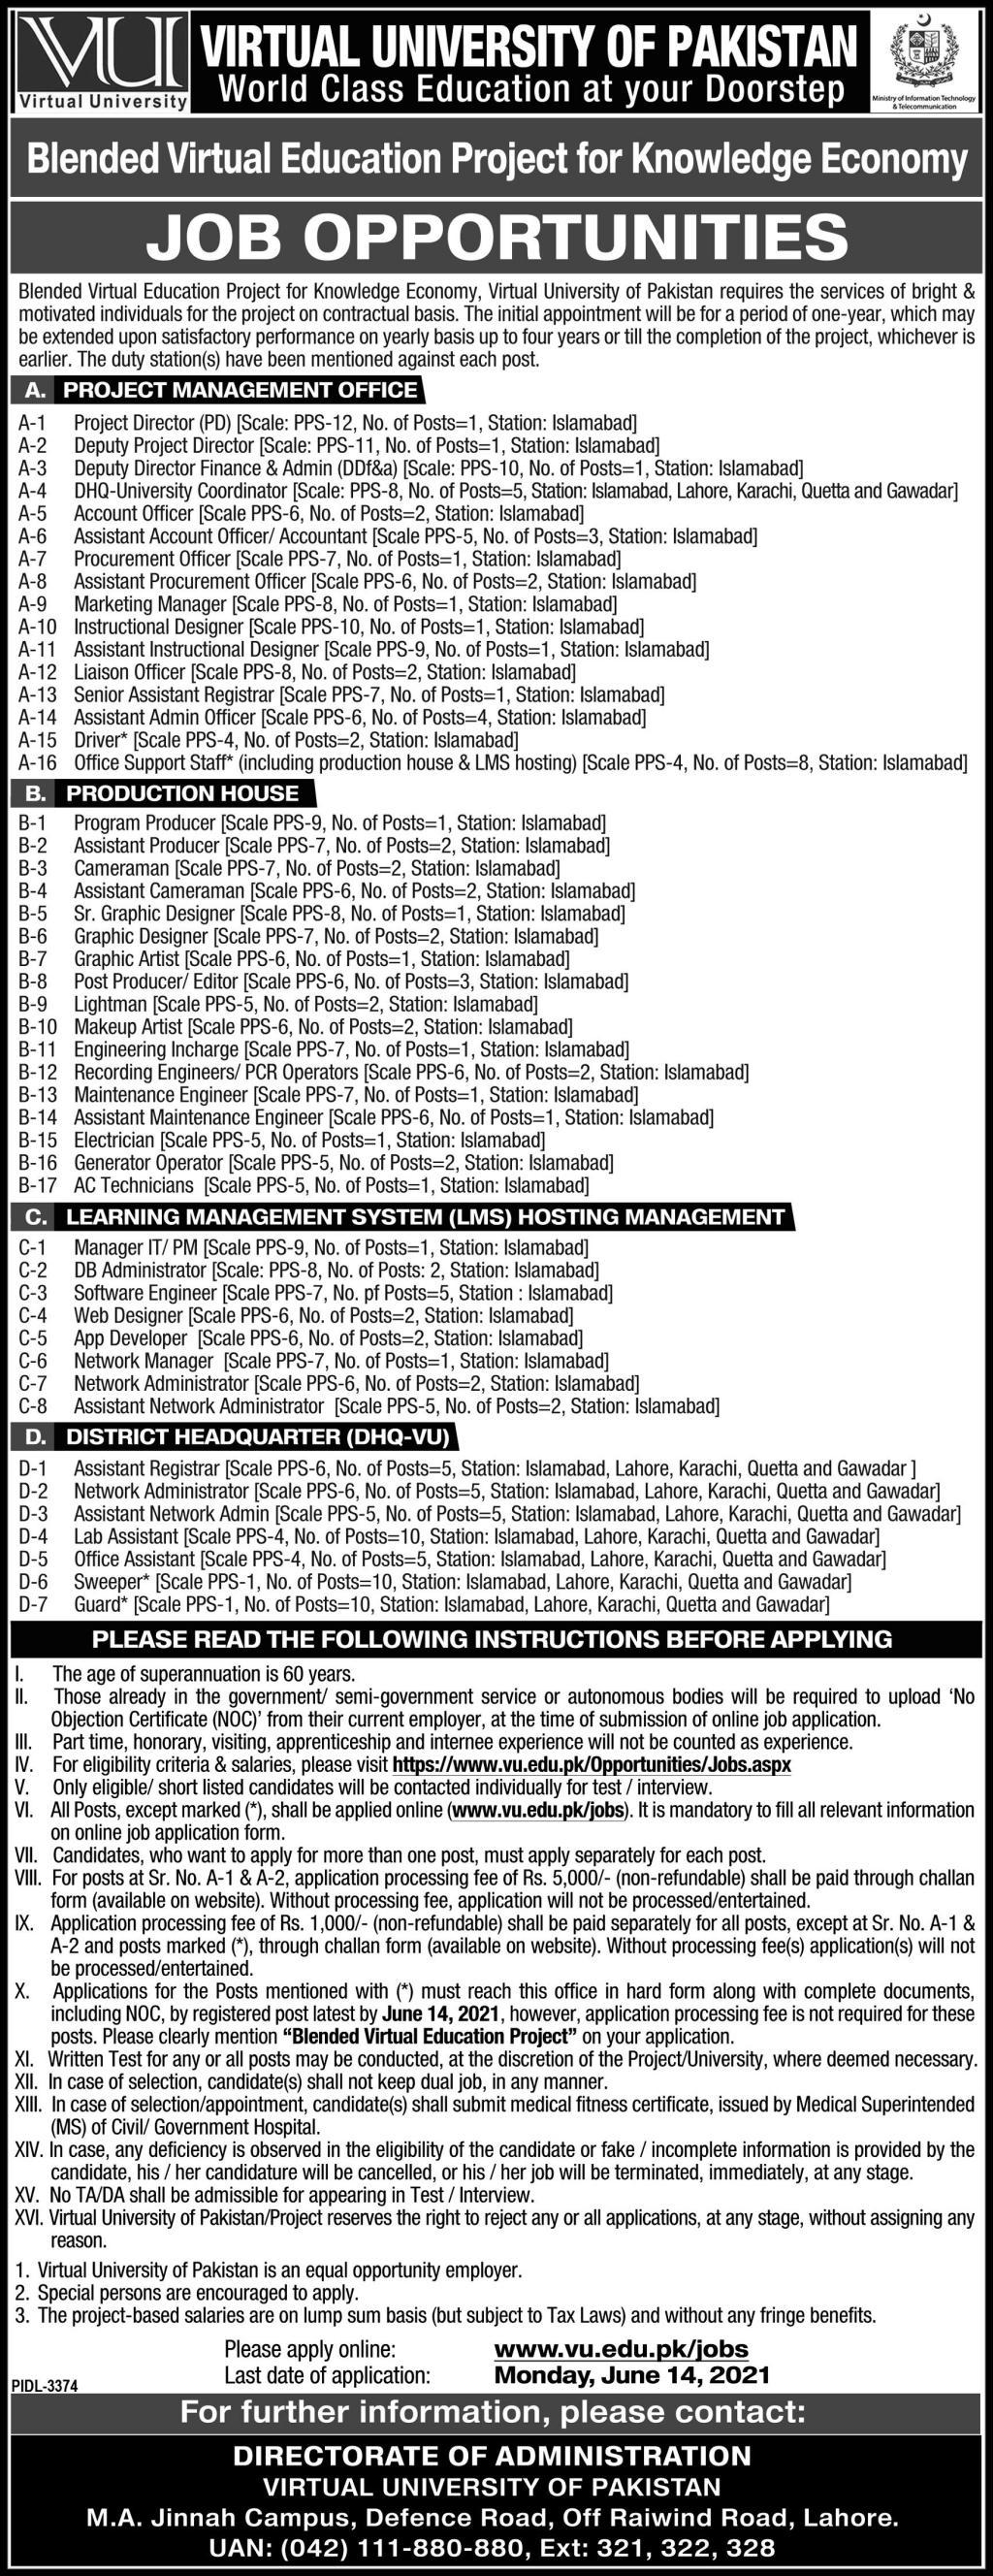 Virtual University of Pakistan VU Jobs 2021